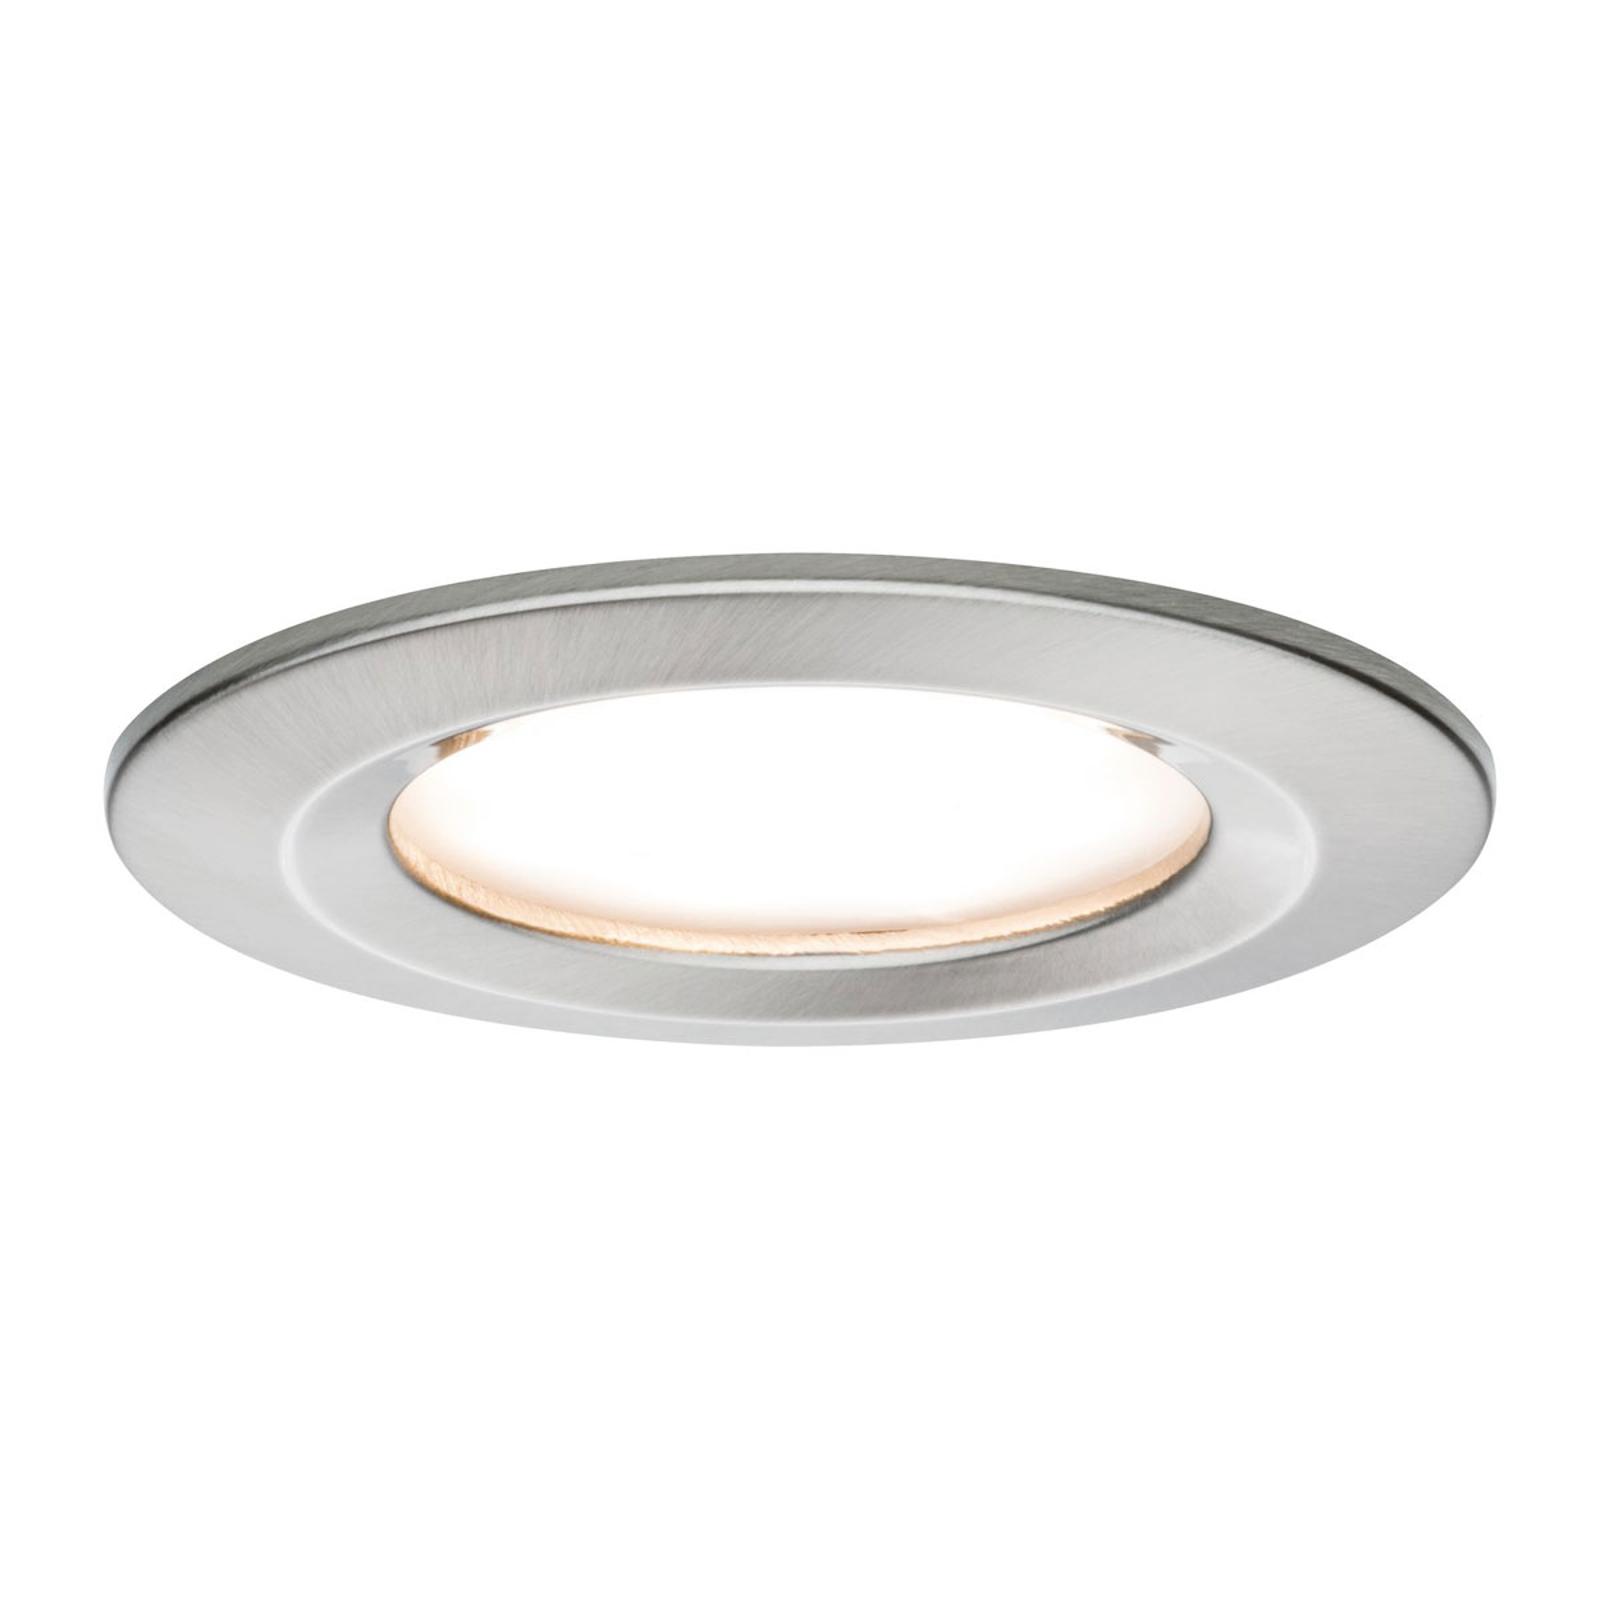 Paulmann LED-Spot Nova Coin rund, dimmbar, Eisen